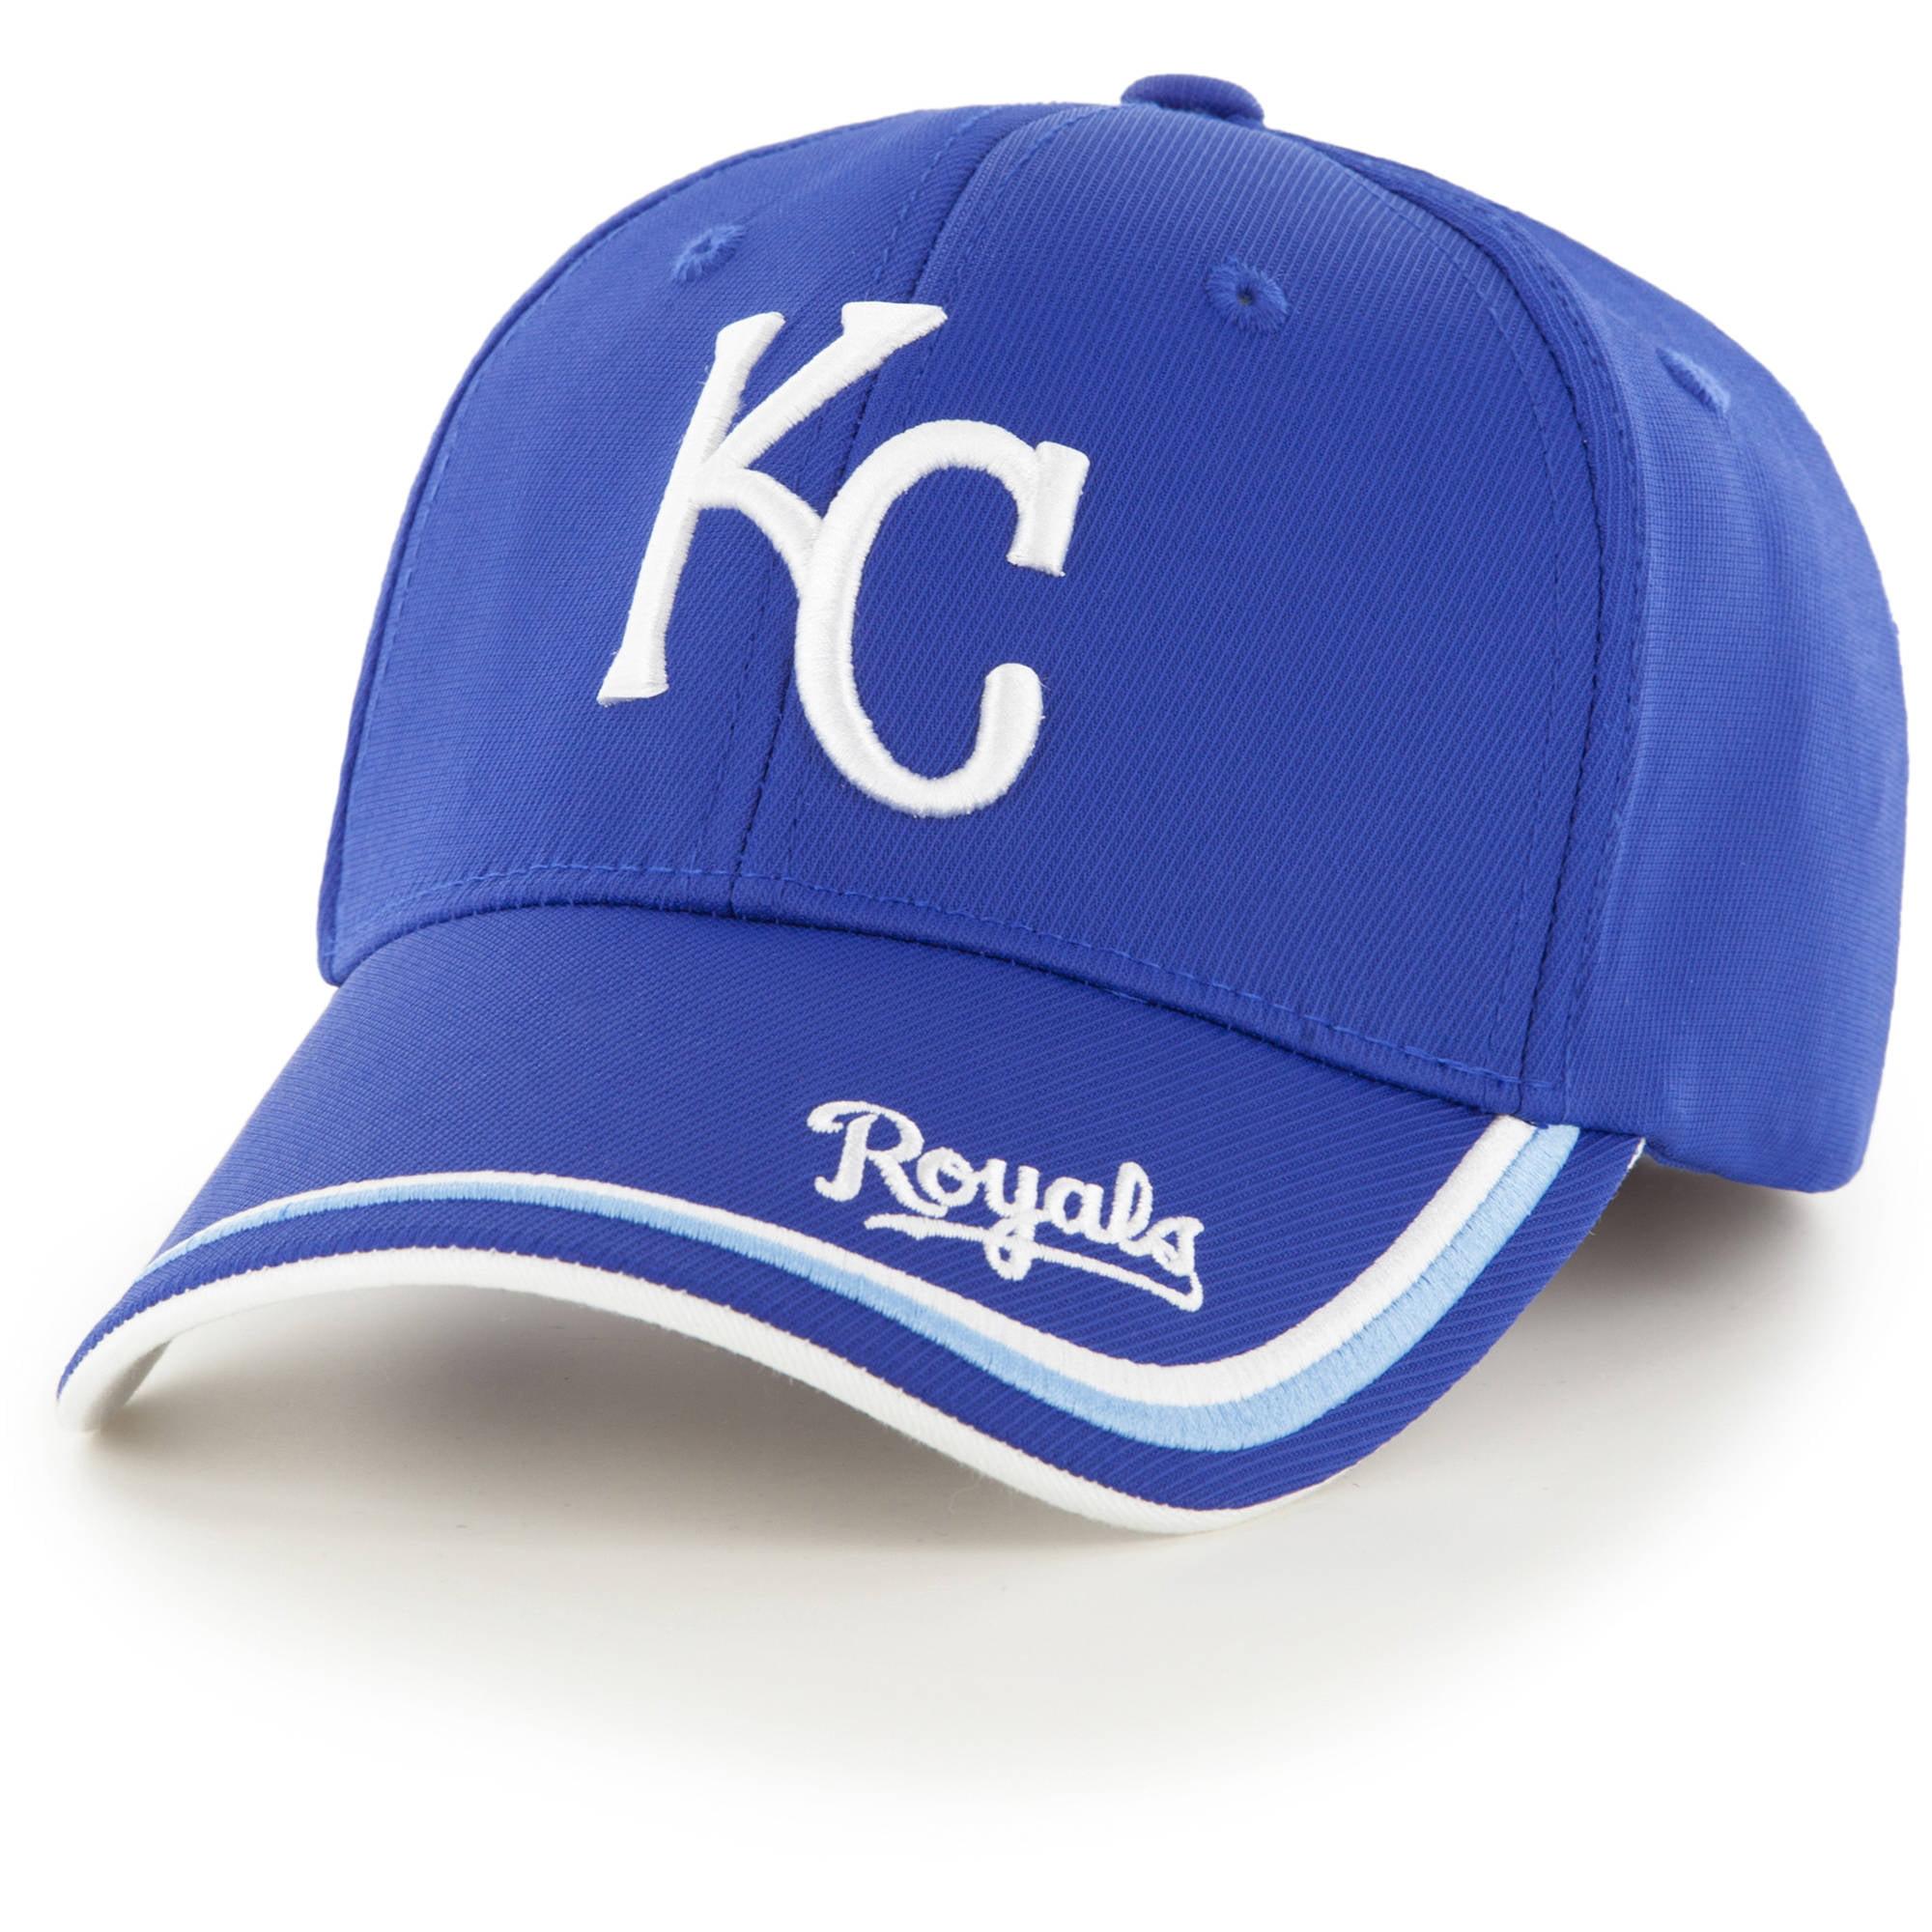 Fan Favorite - MLB Forest Cap, Kansas City Royals